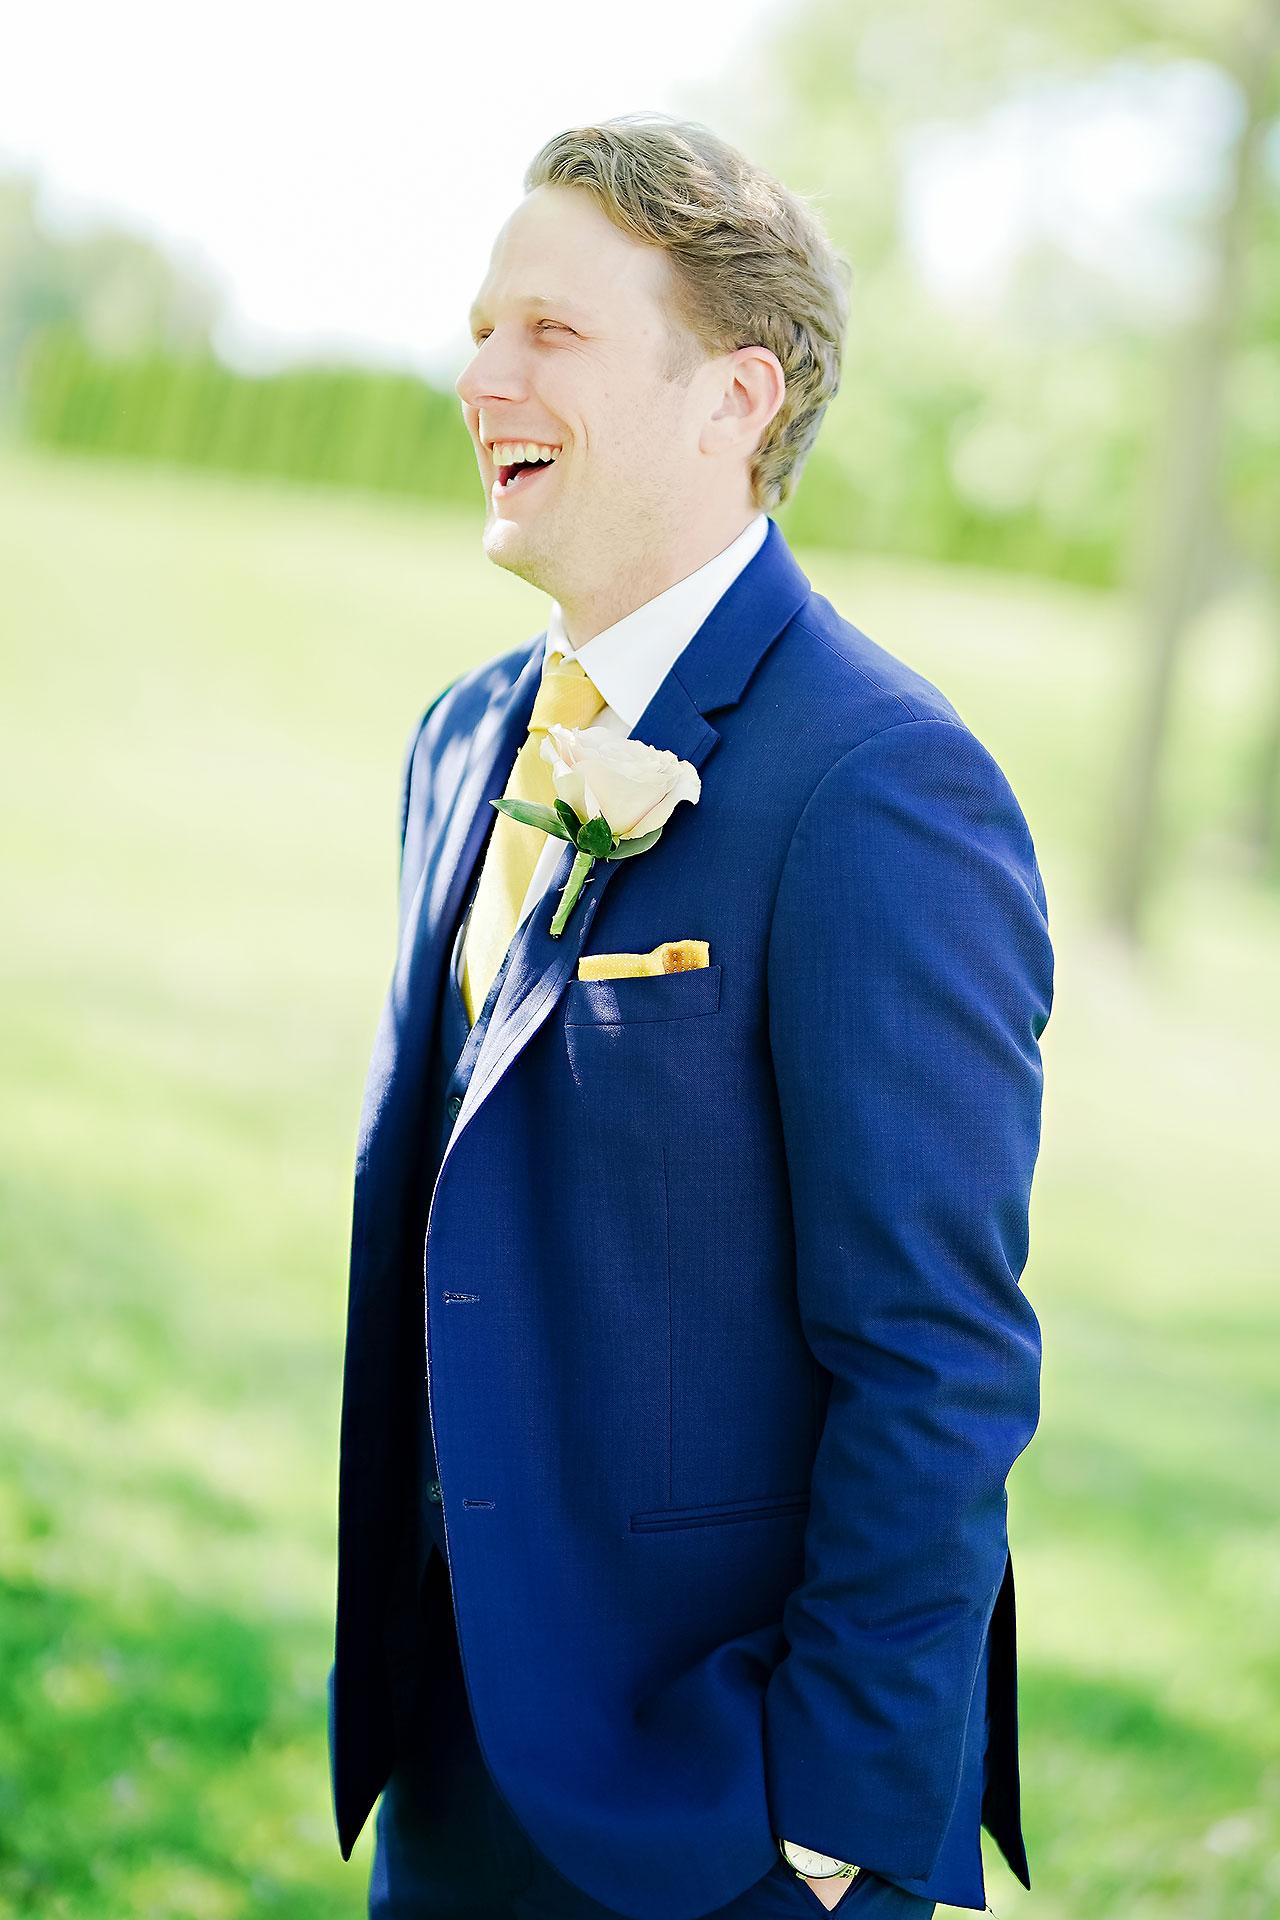 Nadia Parker Black Iris Estate Carmel Indiana Wedding May 2021 068